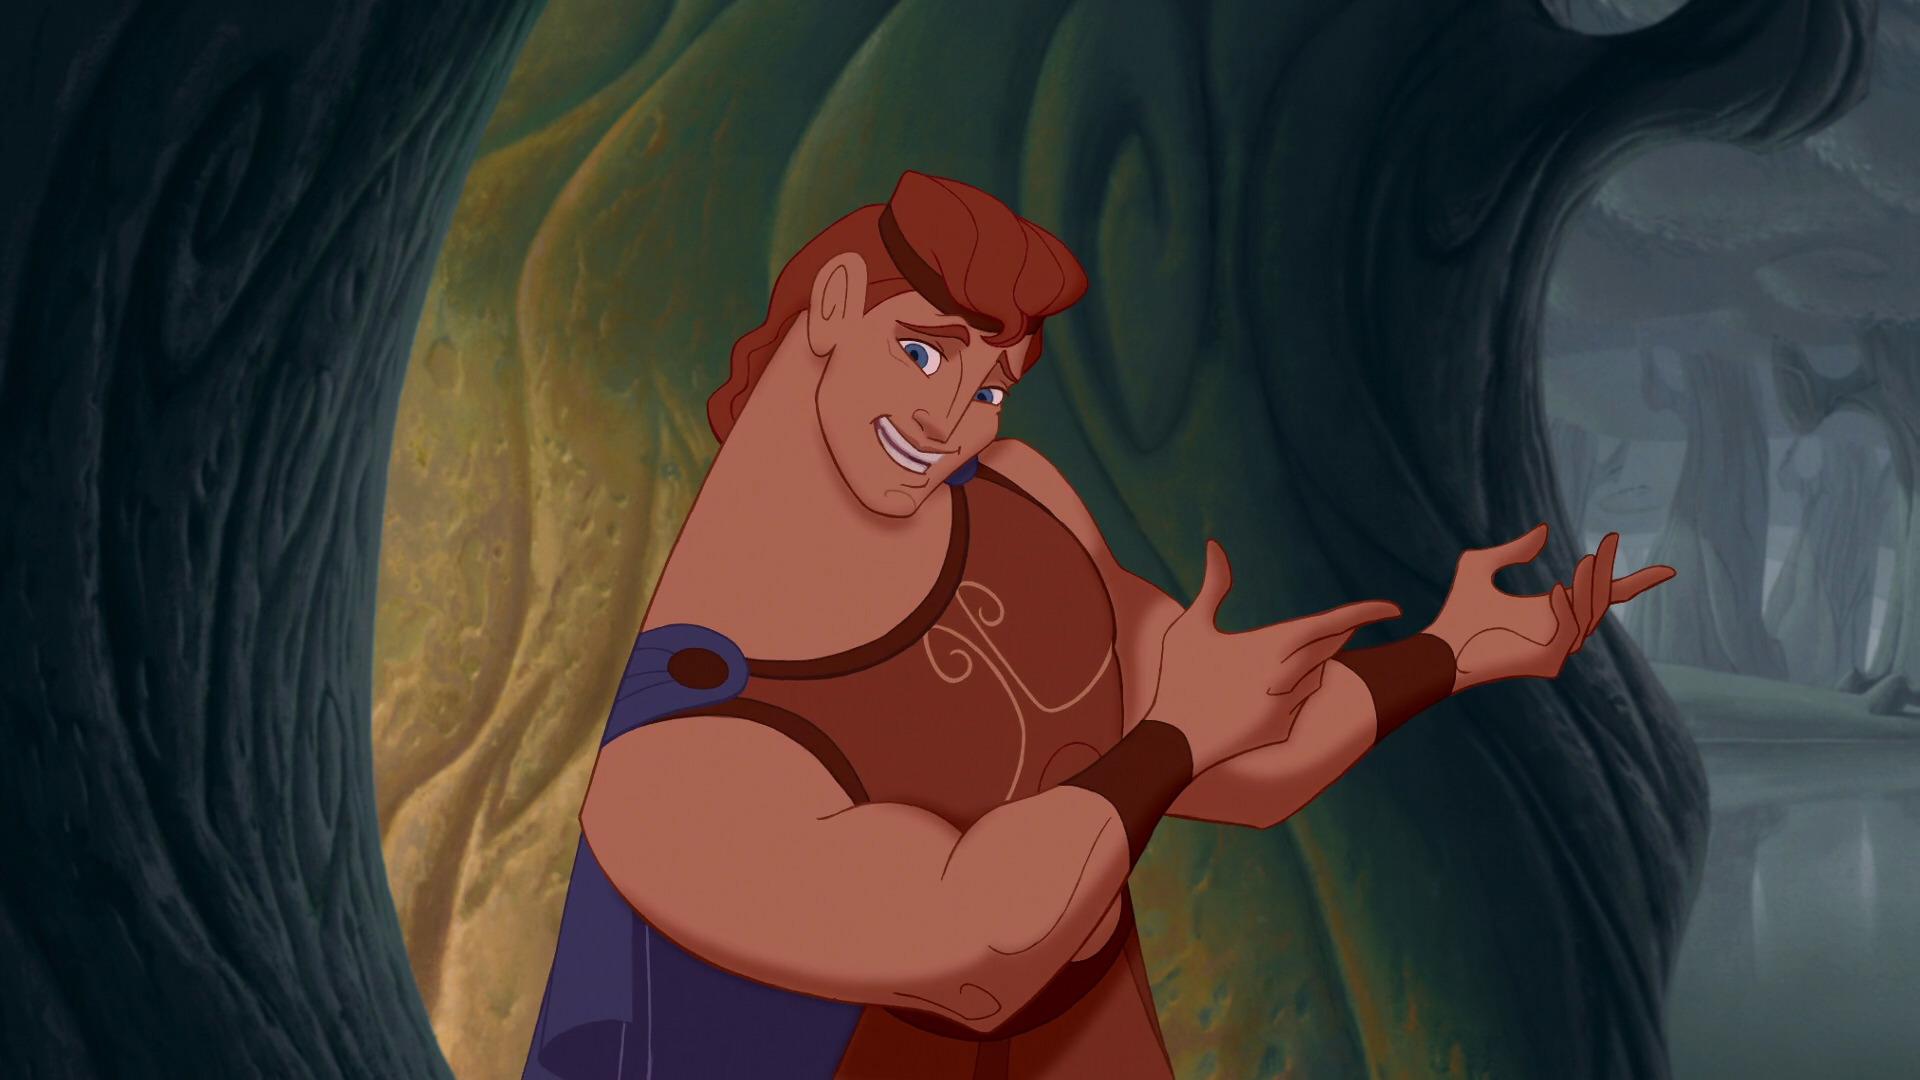 Hercules character disney wiki - Hercule walt disney ...